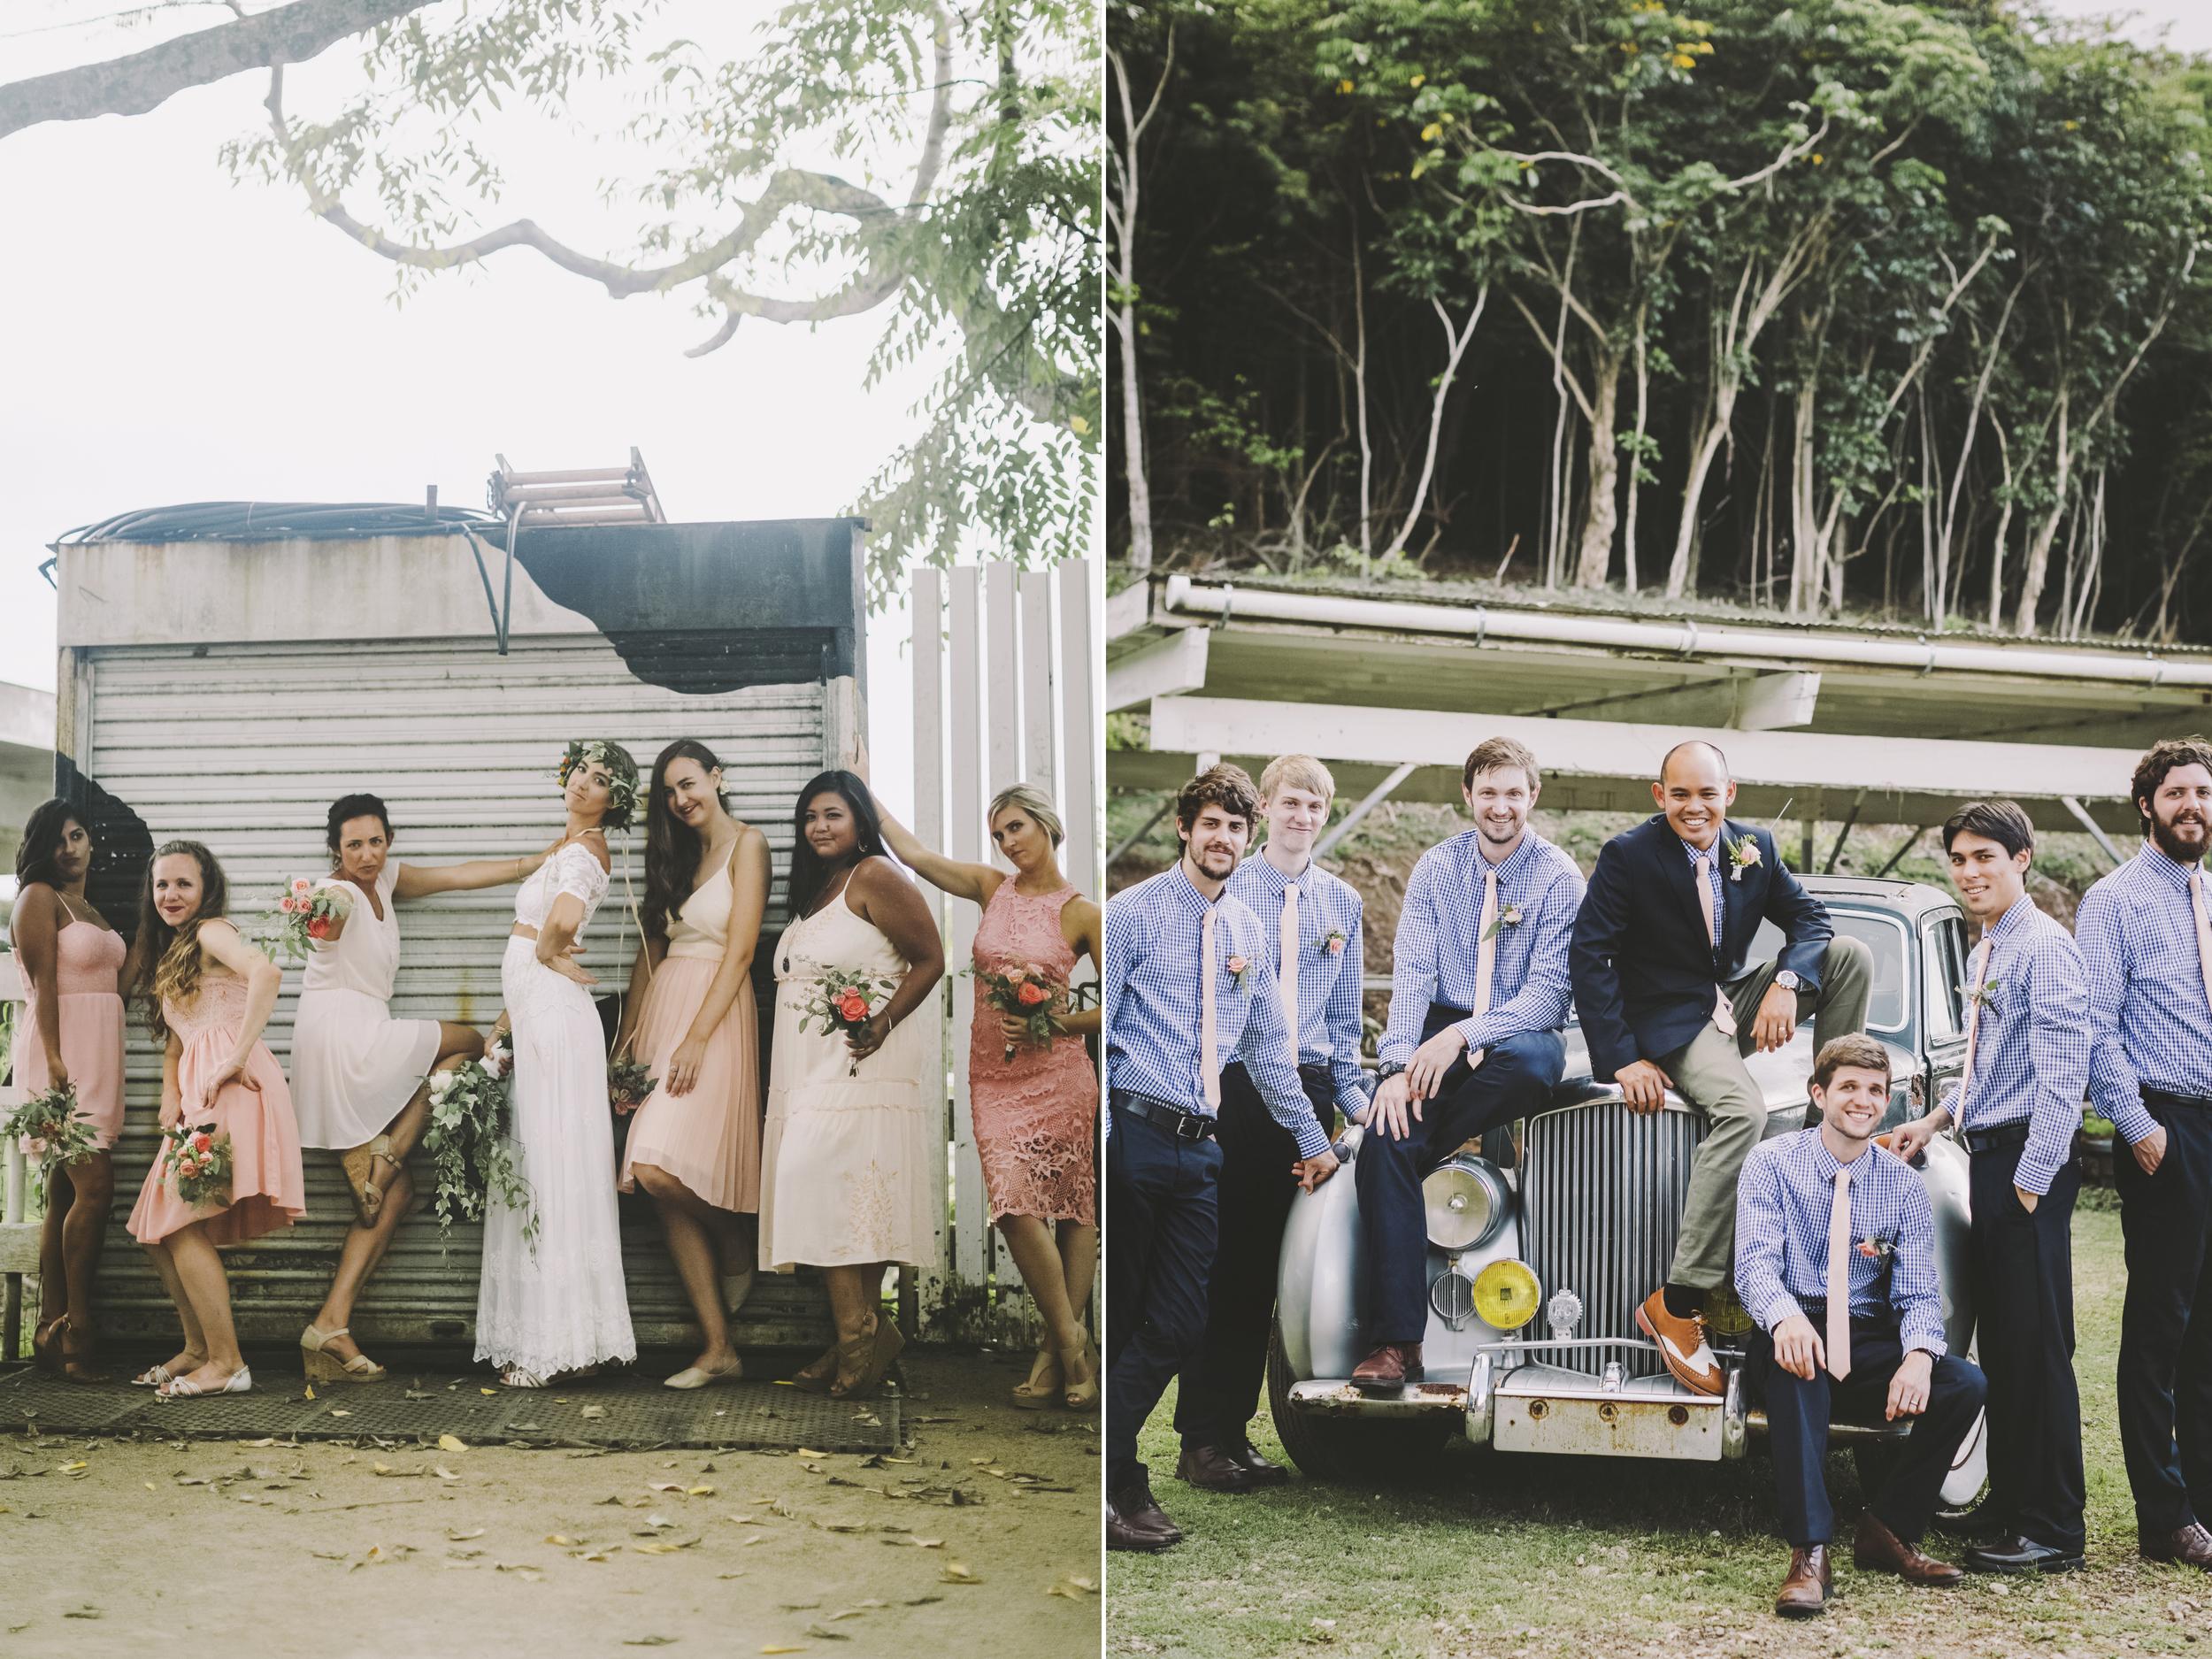 angie-diaz-photography-oahu-hawaii-wedding-tradewinds-ranch-75.jpg